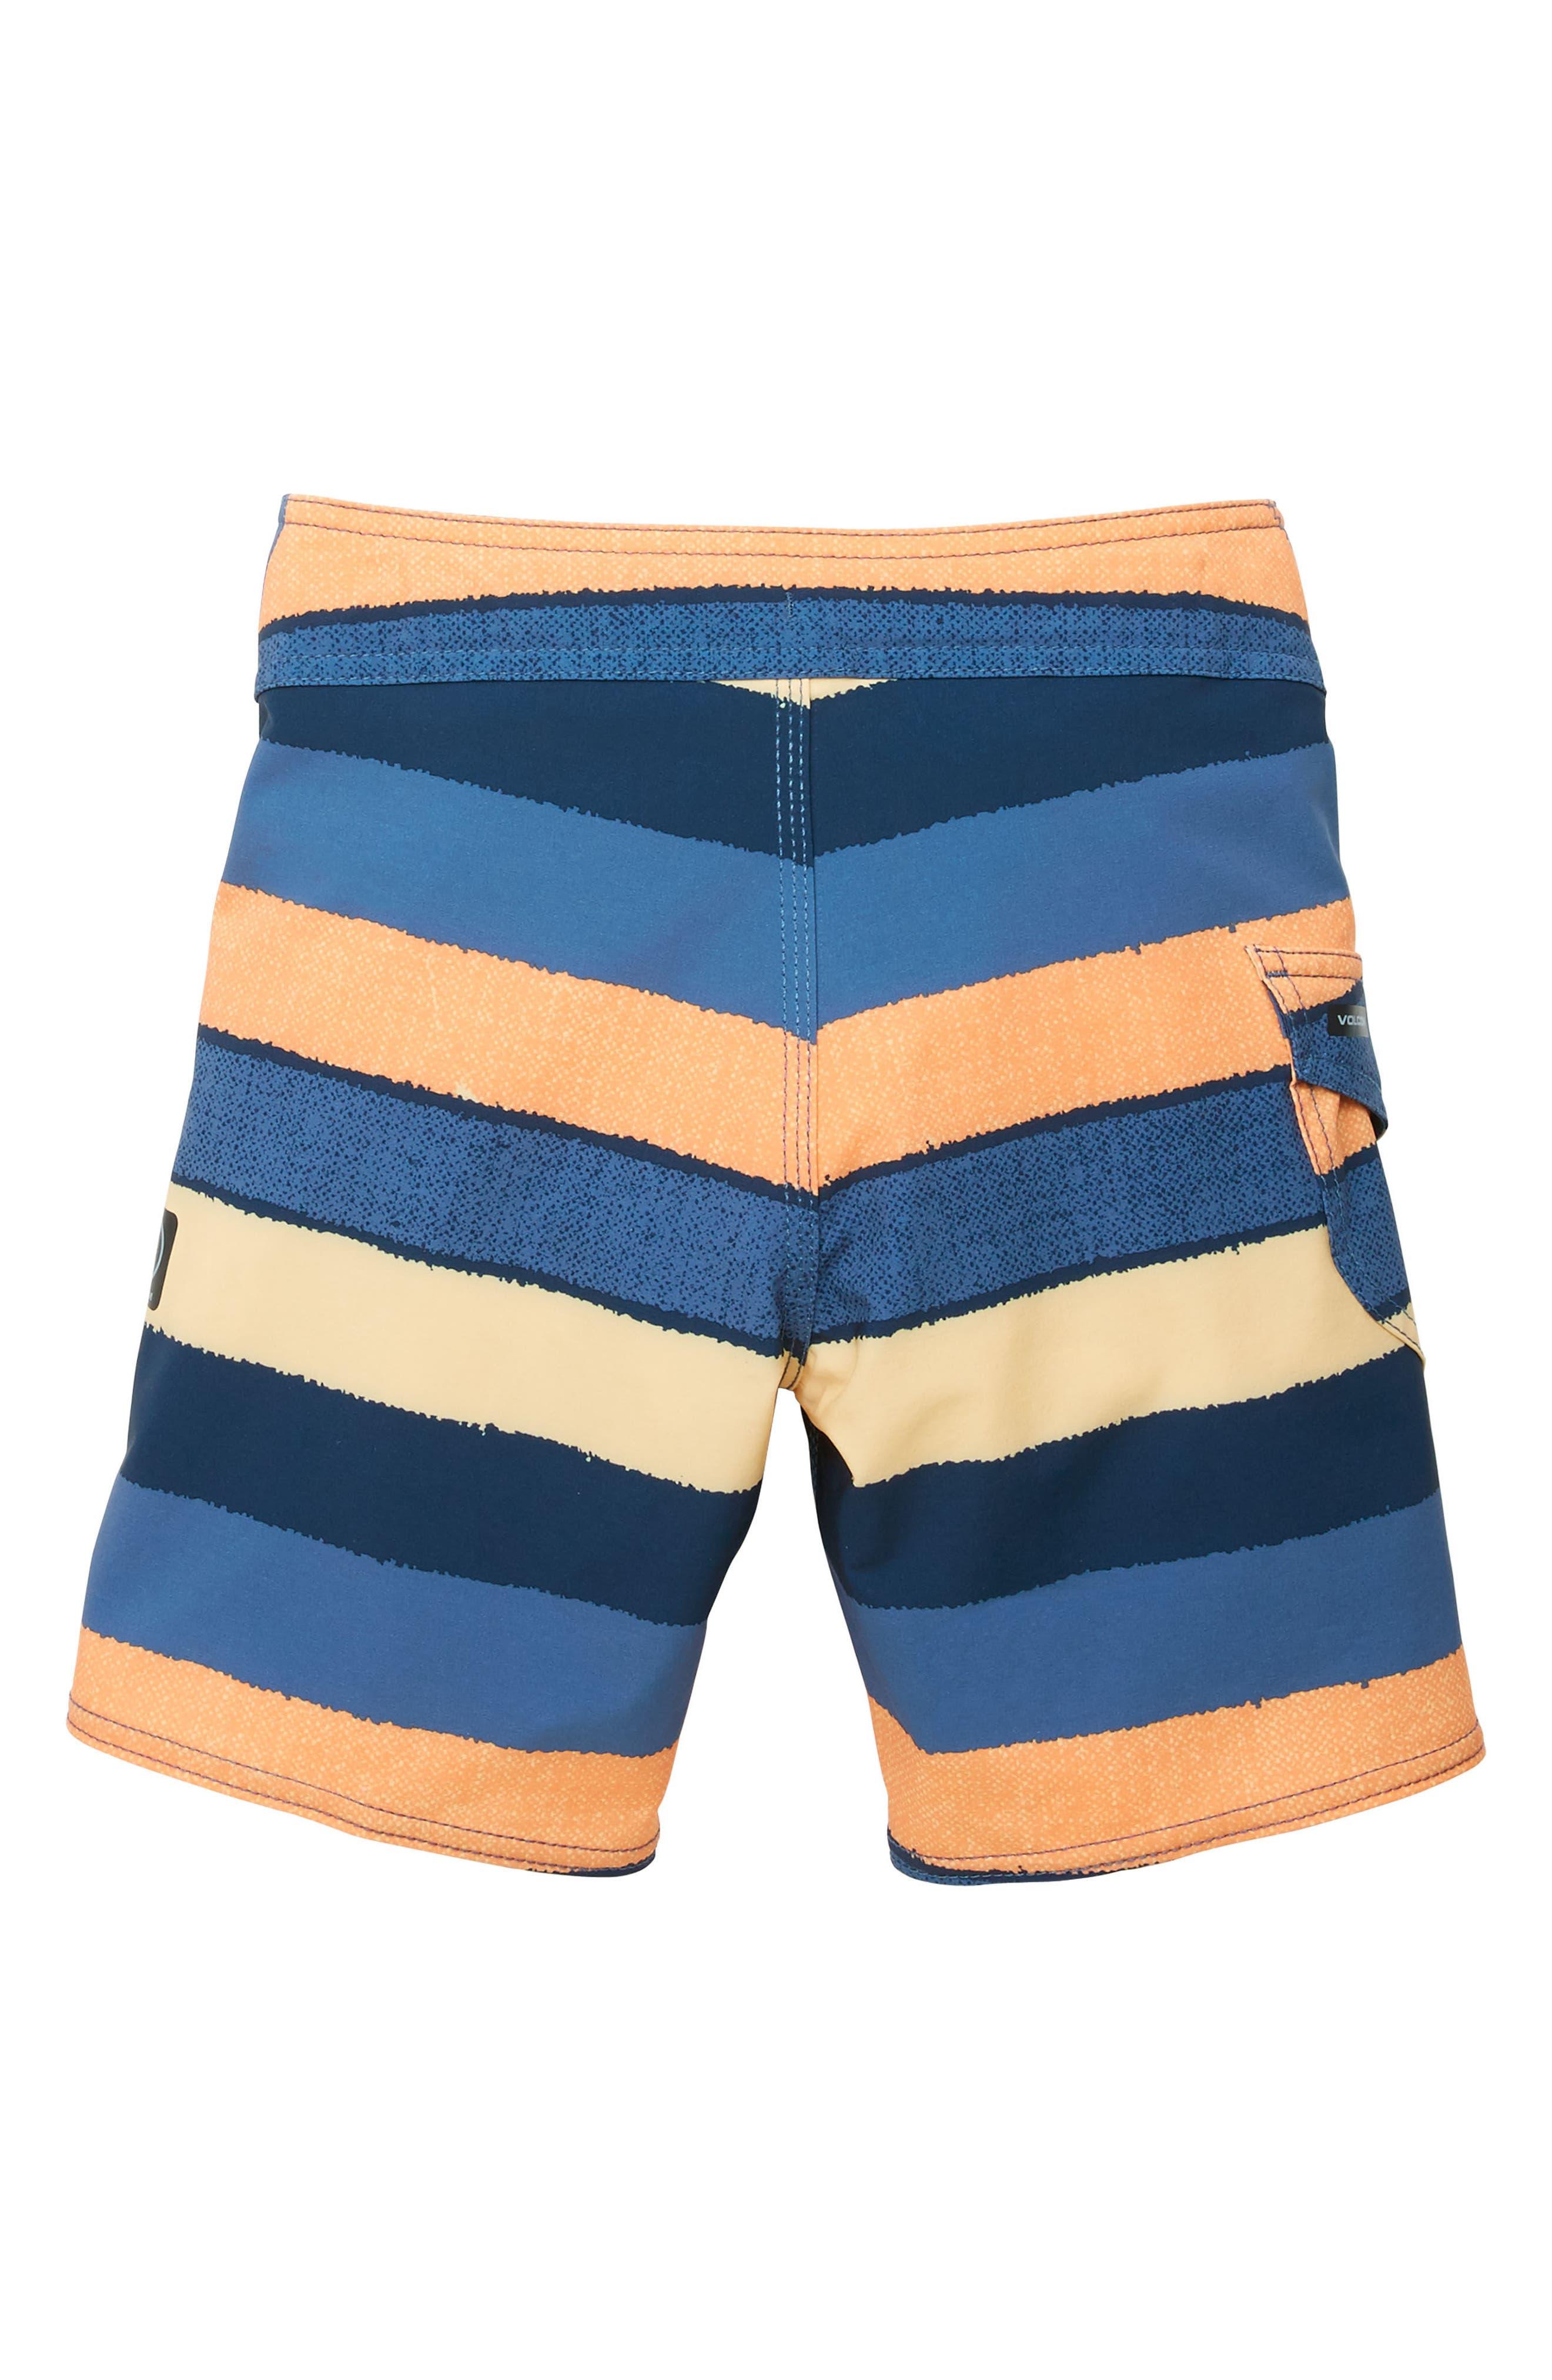 Magnetic Liney Mod Board Shorts,                             Alternate thumbnail 2, color,                             Sunburst